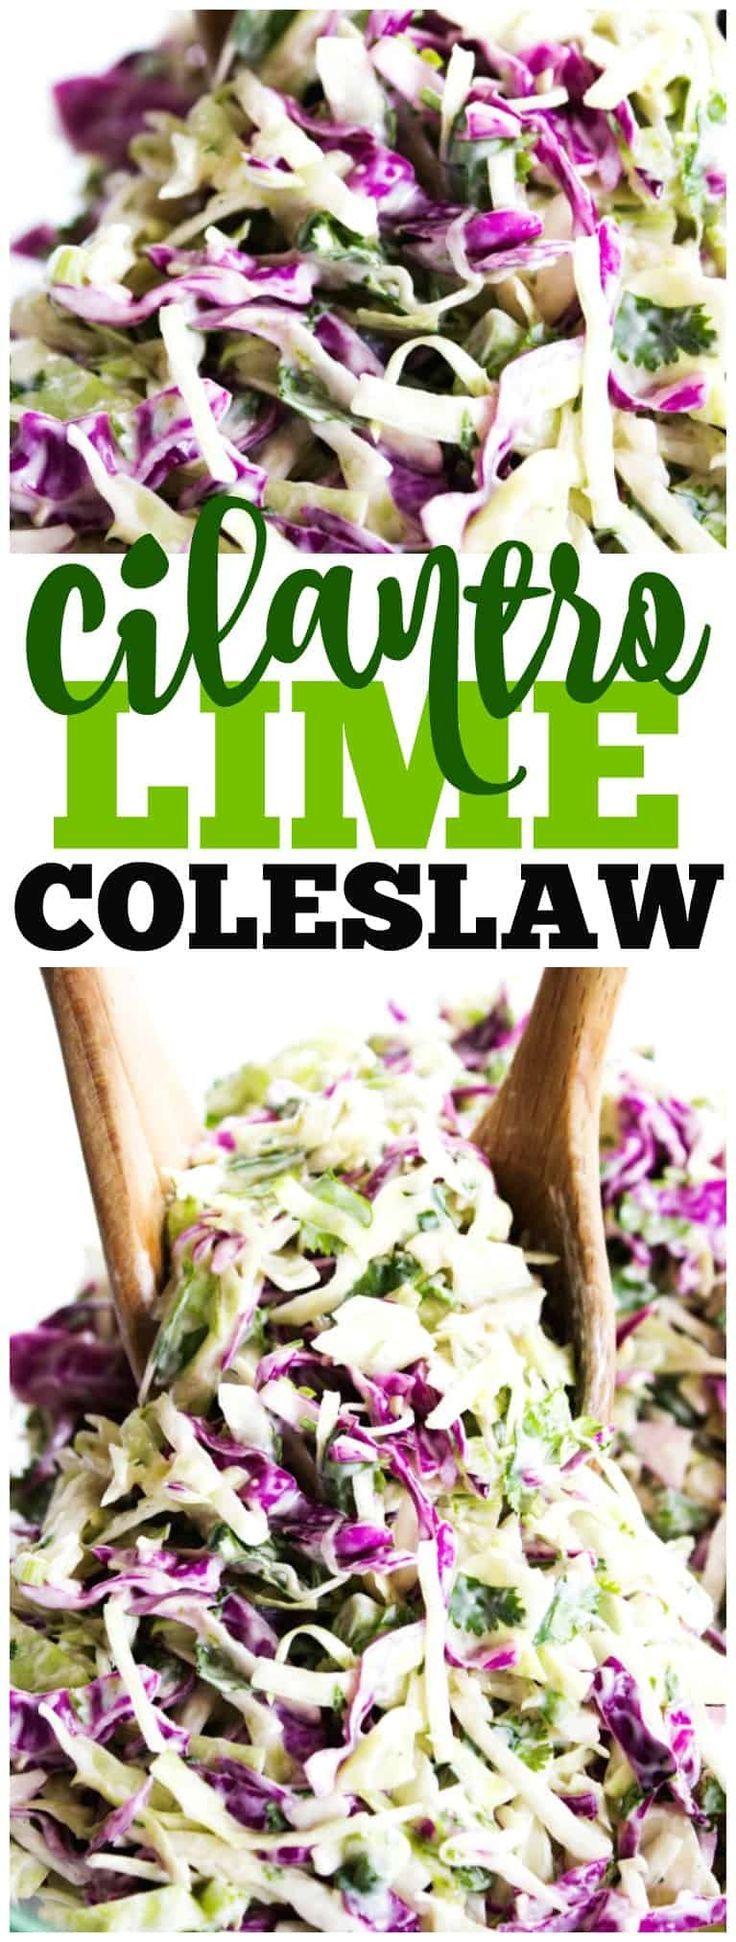 Cilantro-Lime Coleslaw #cilantrolimeslaw